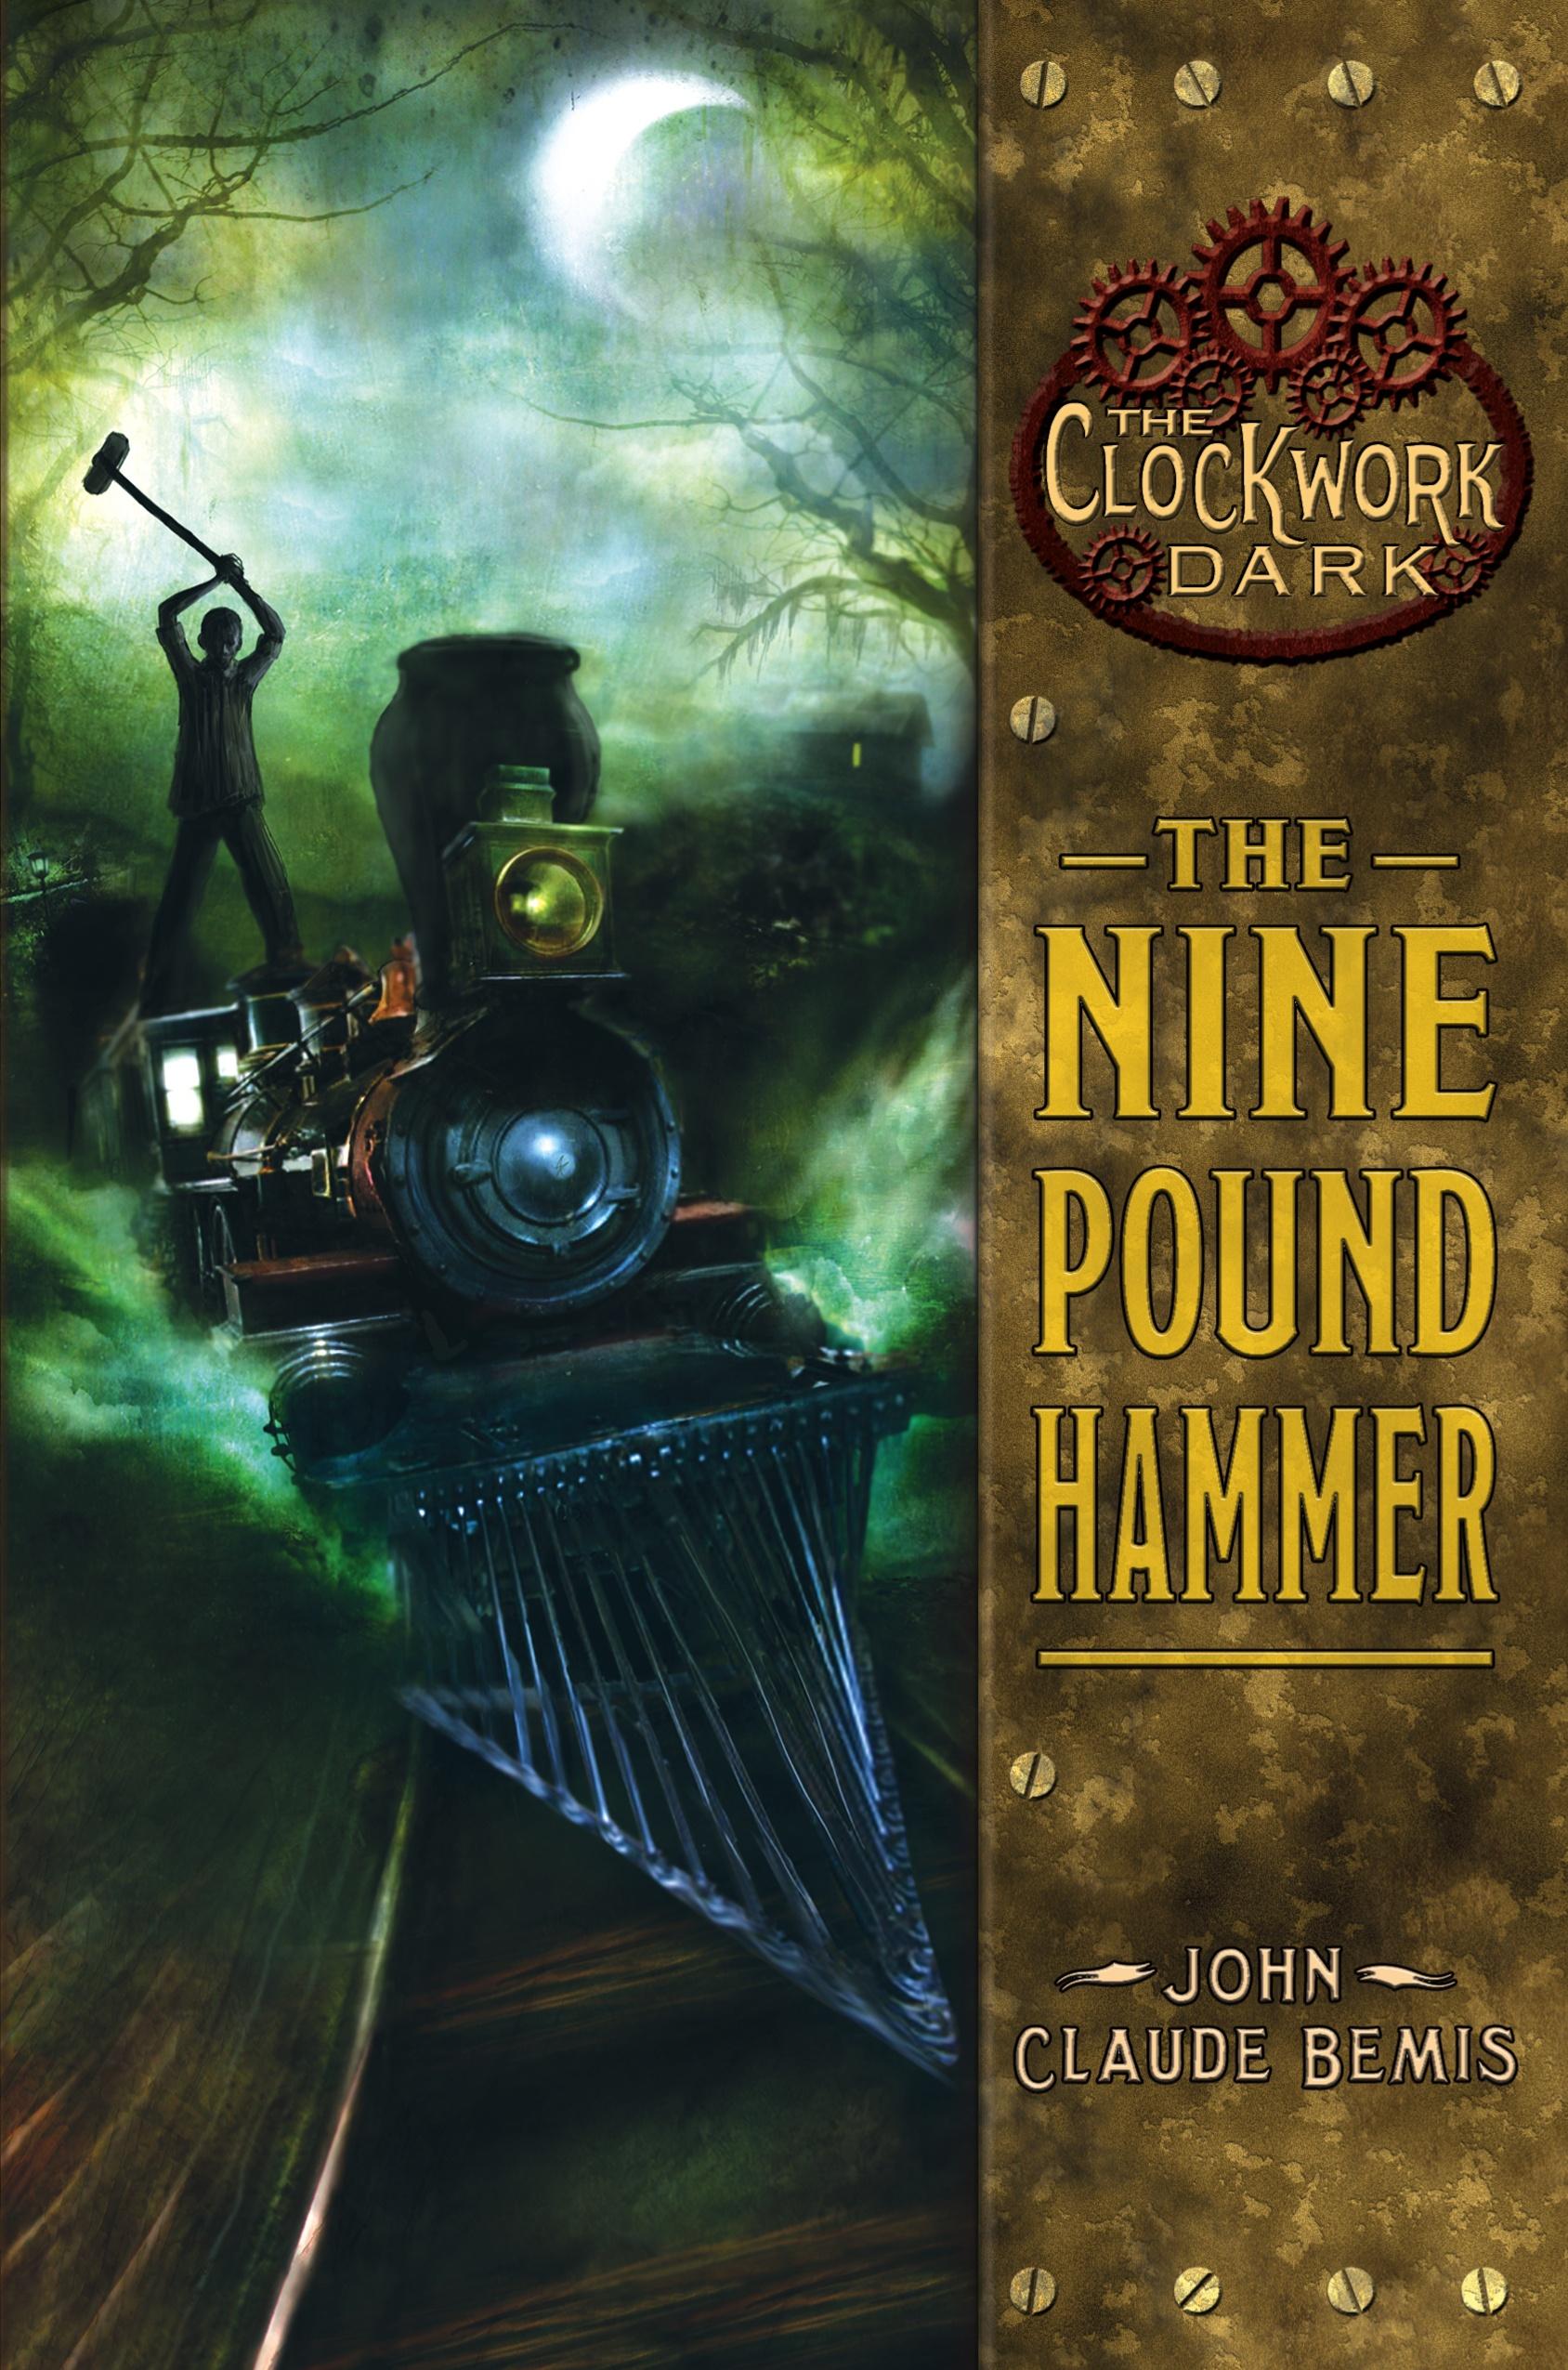 Book One - The Nine Pound Hammer